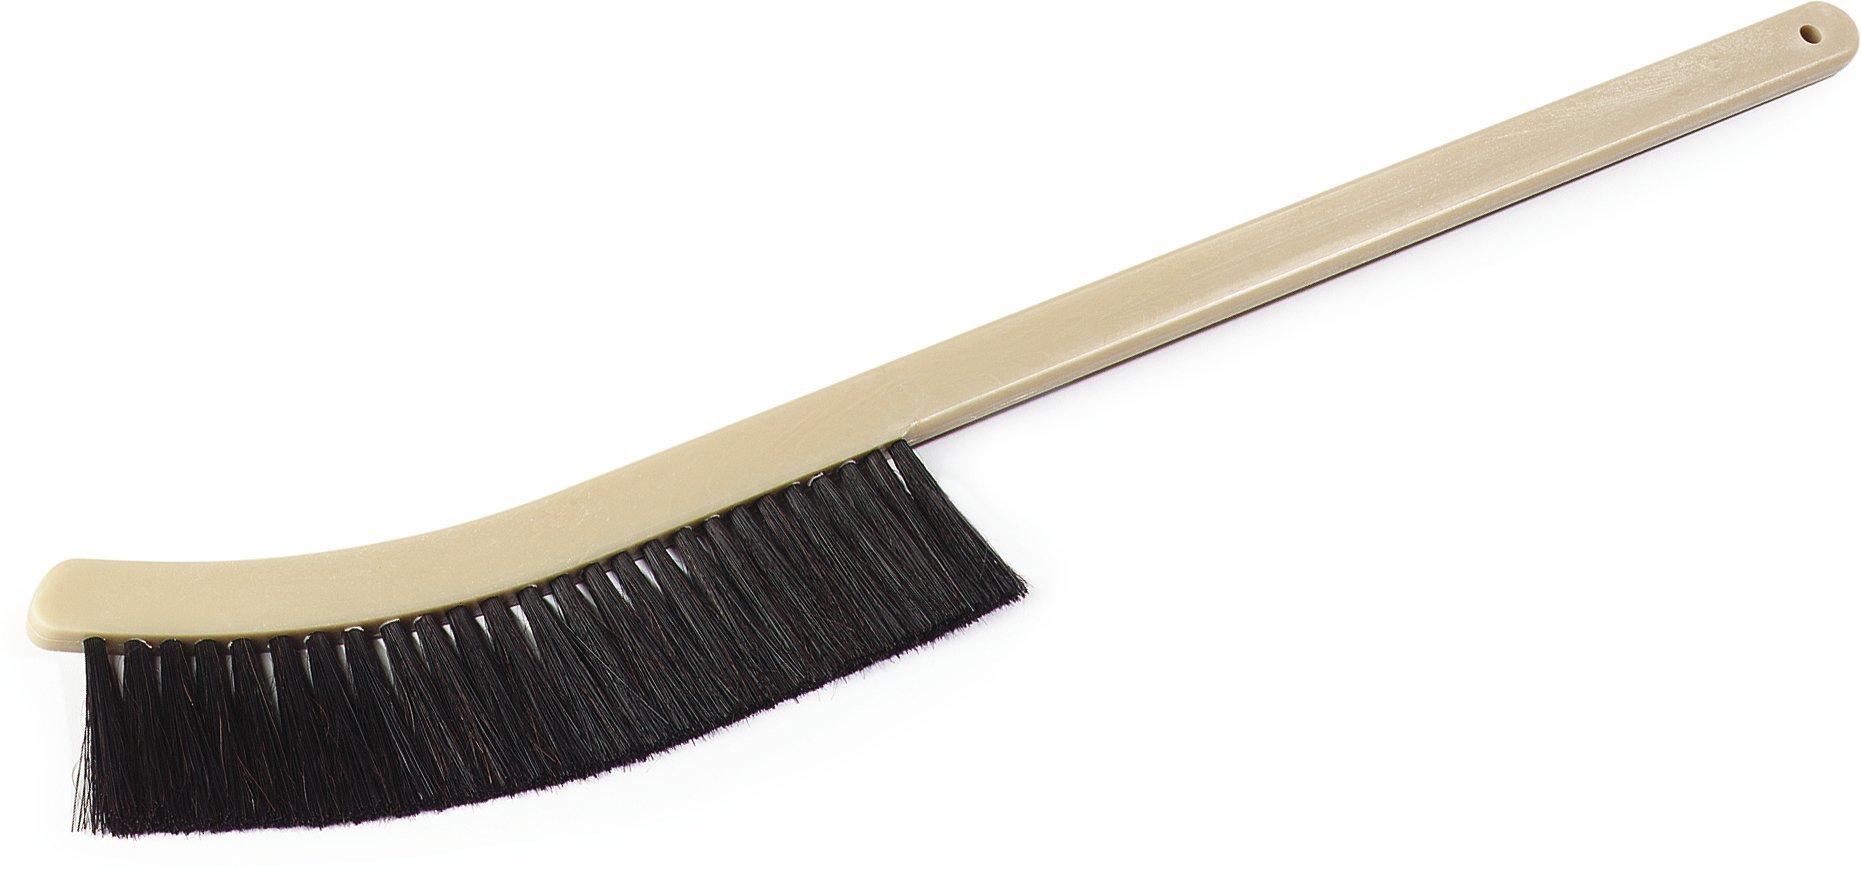 Carlisle 4541103 Narrow Radiator Brush, Plastic Block, 2''-Long Black Horsehair/Polypropylene Bristles, 24'' Length, 9'' Brush Length, 2'' Bristle Trim, Black (Case of 12)